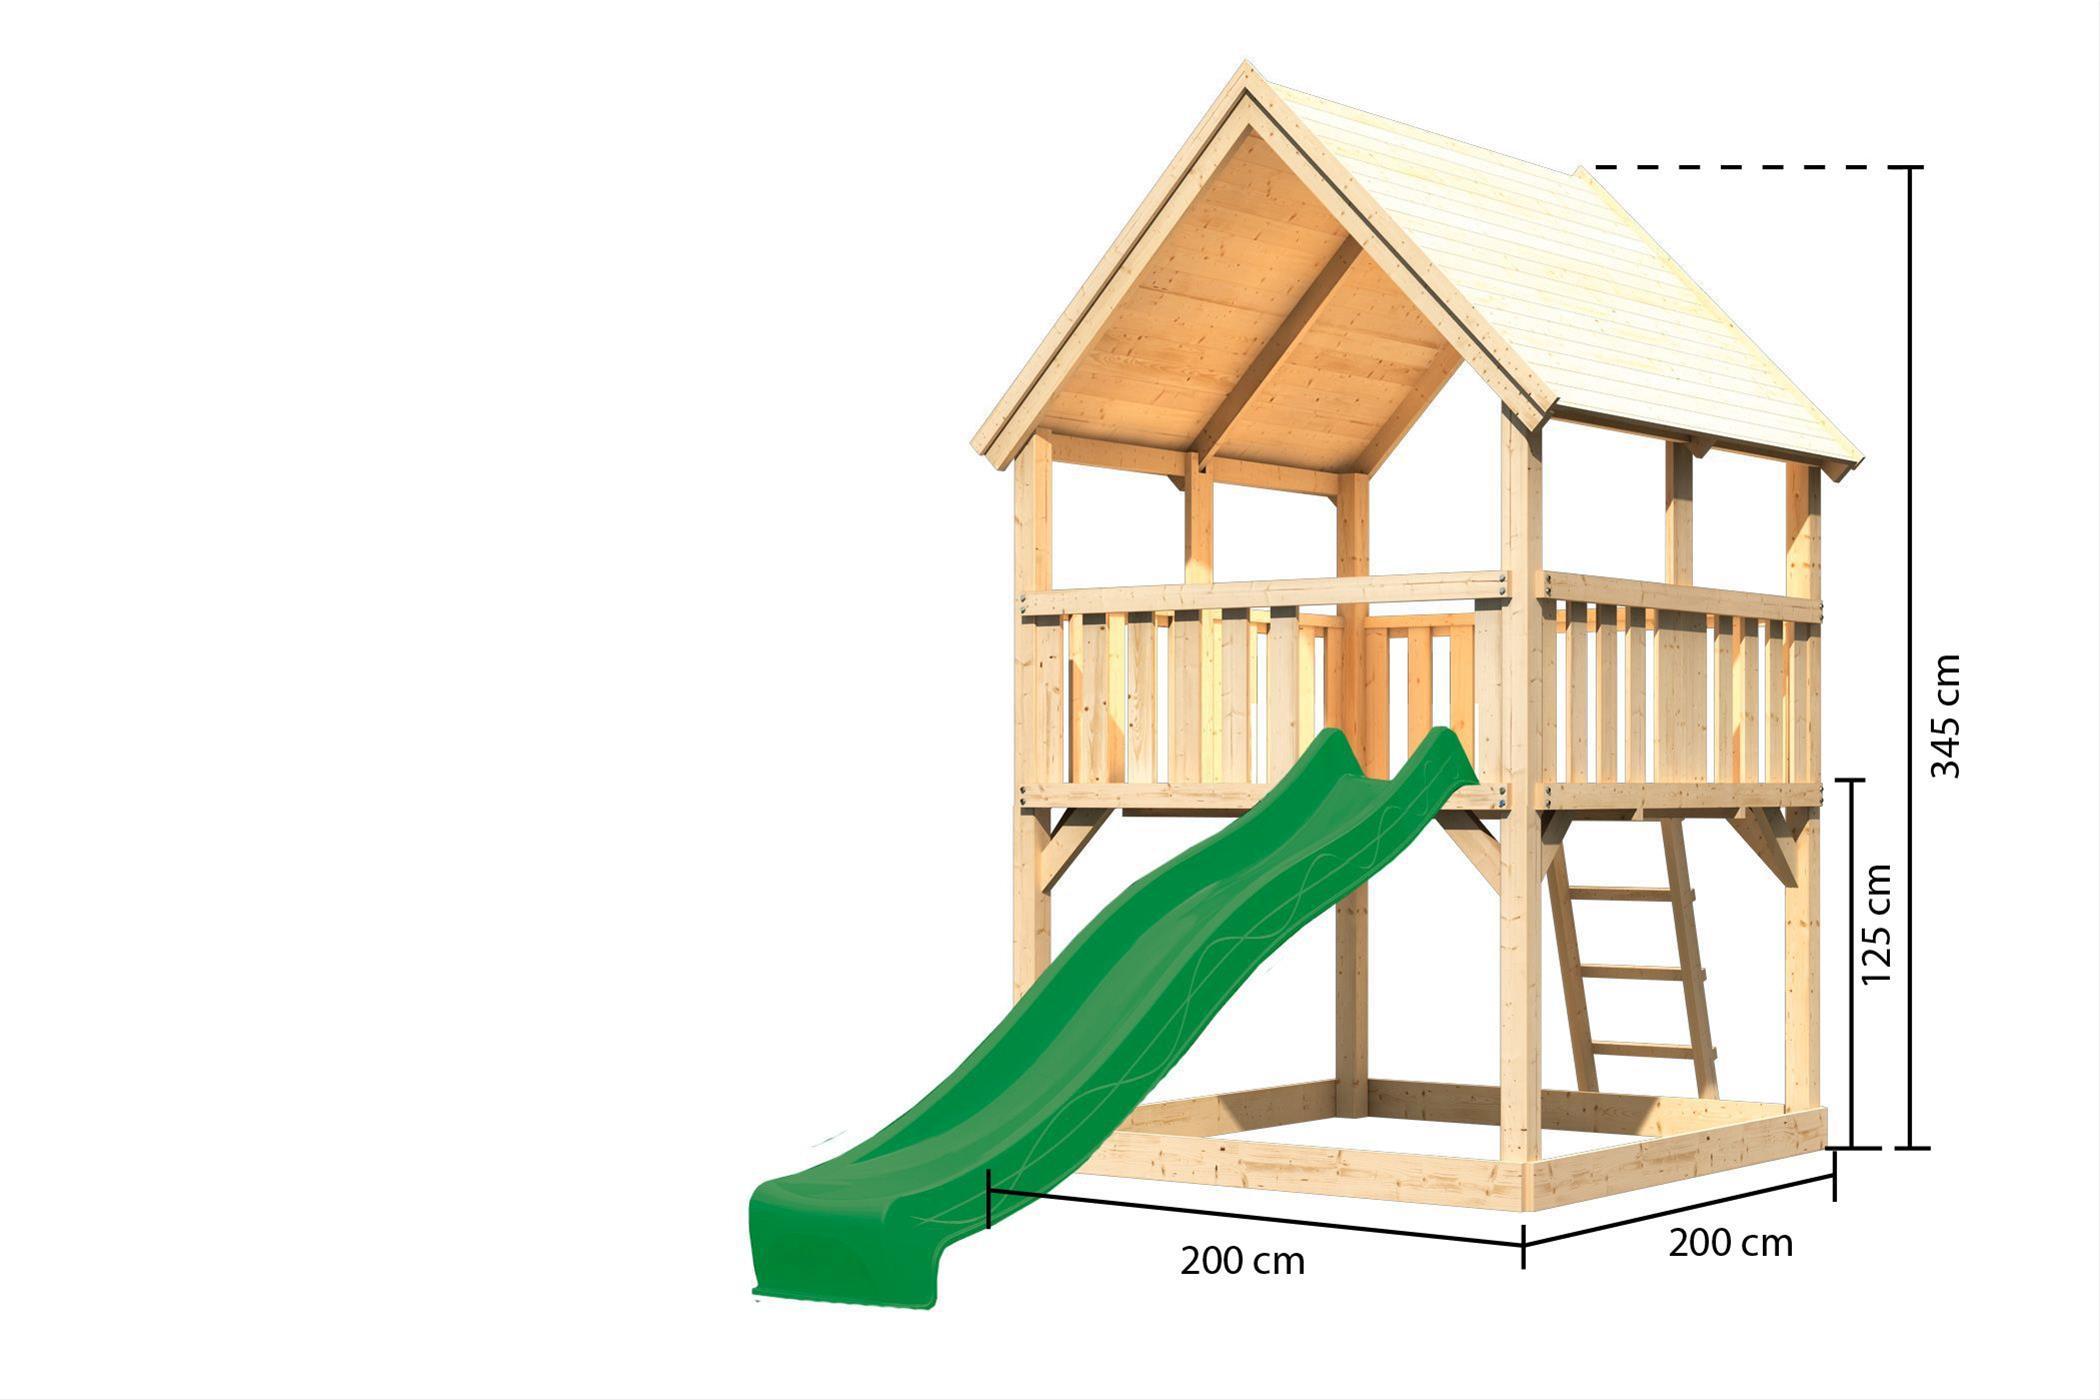 Spielturm / Kletterturm Karibu Akubi Luis Set A Rutsche grün 217x205cm Bild 3